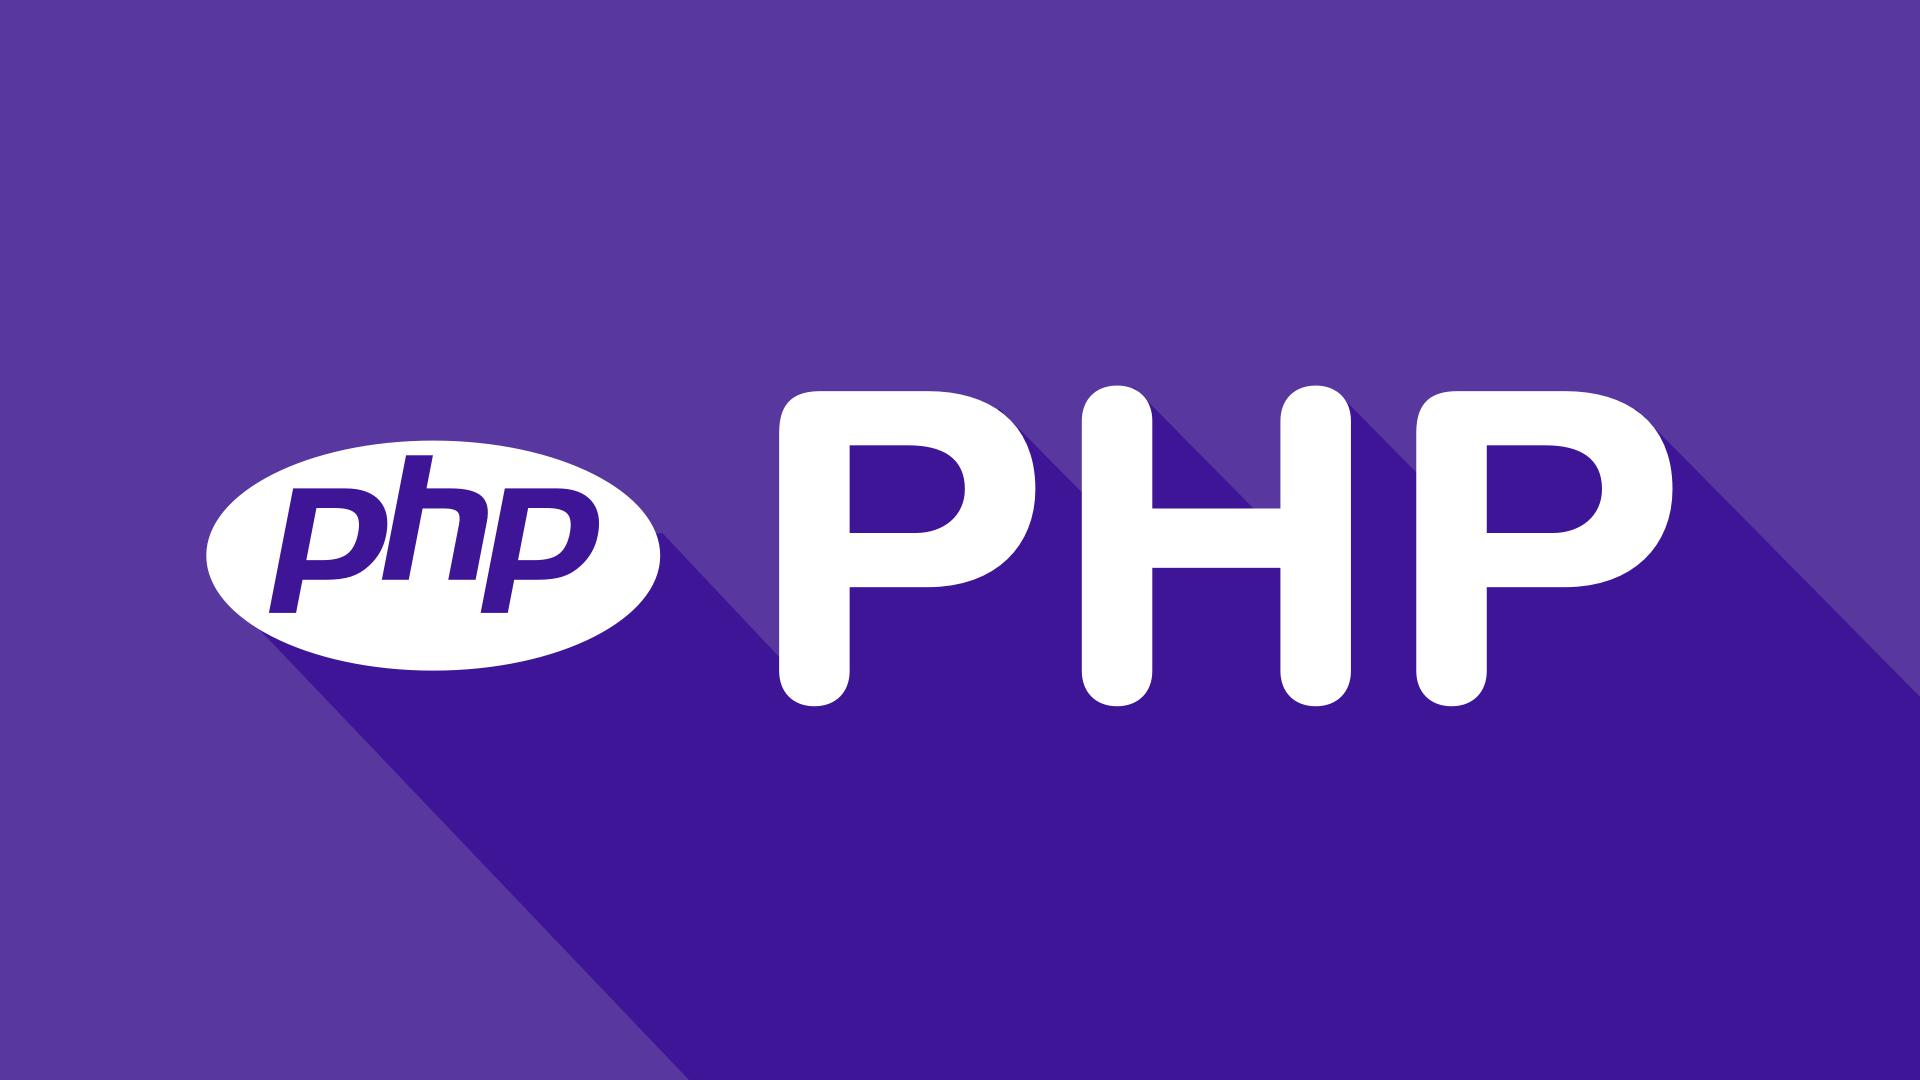 PHP whatsapp group